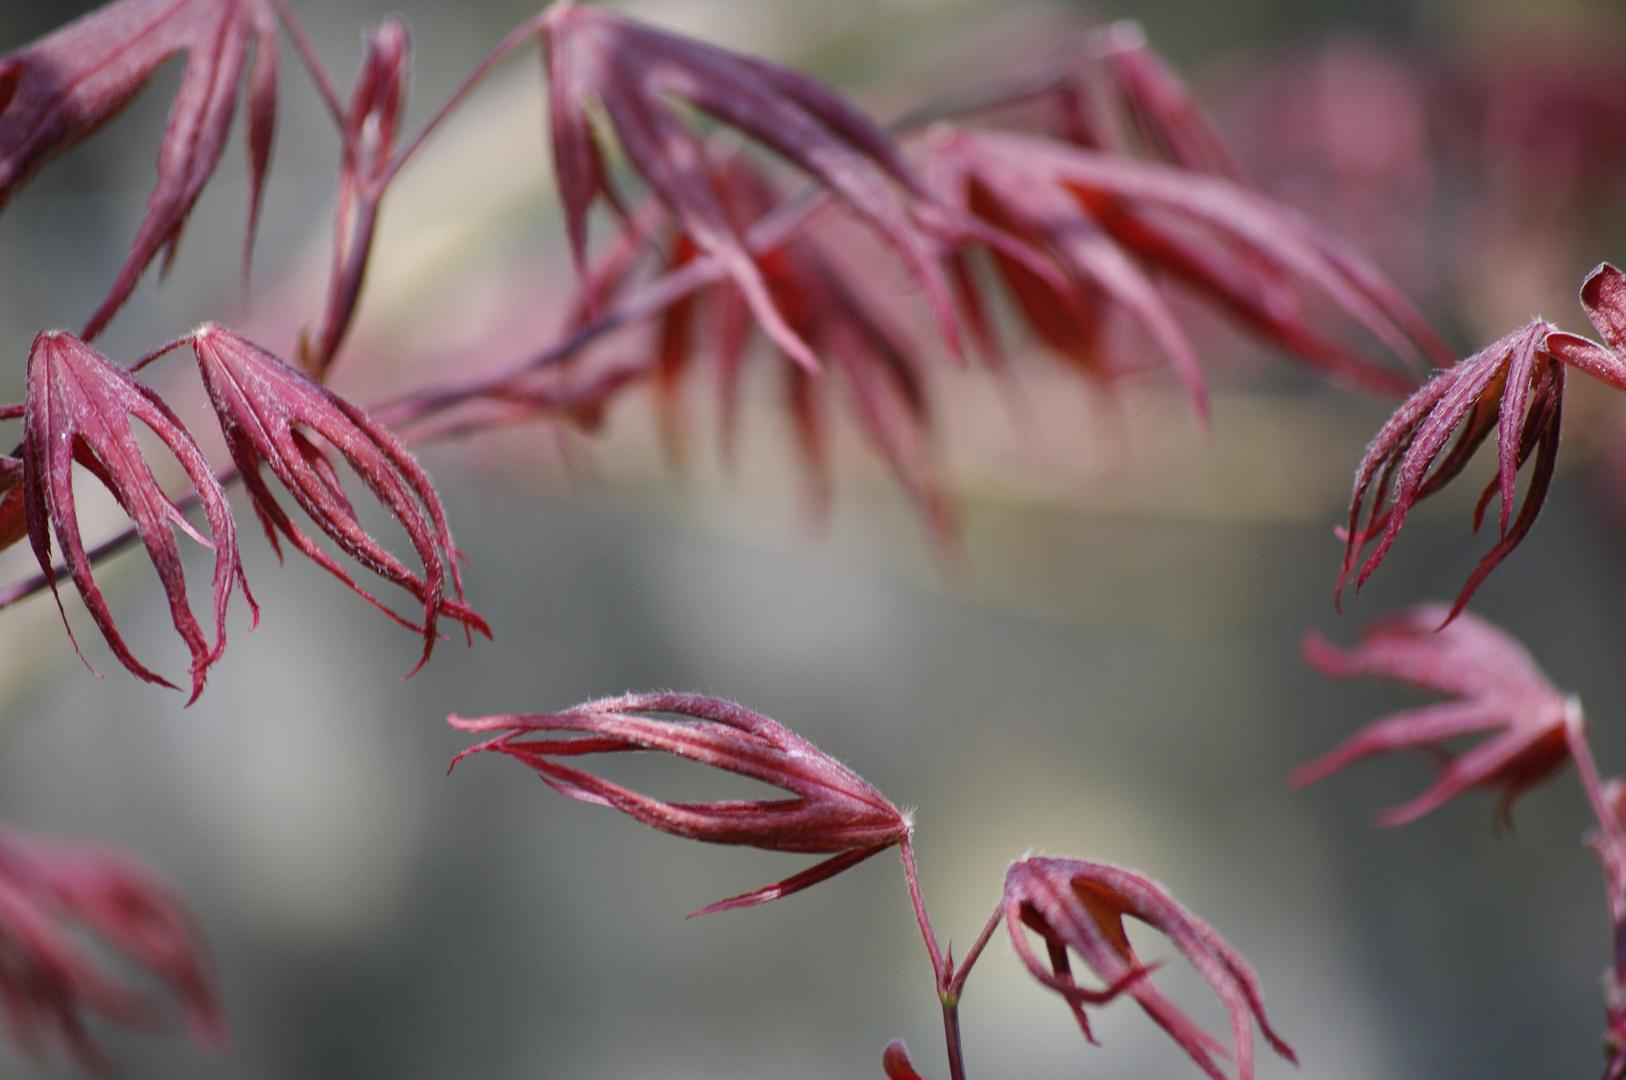 Tanz der roten Blätter